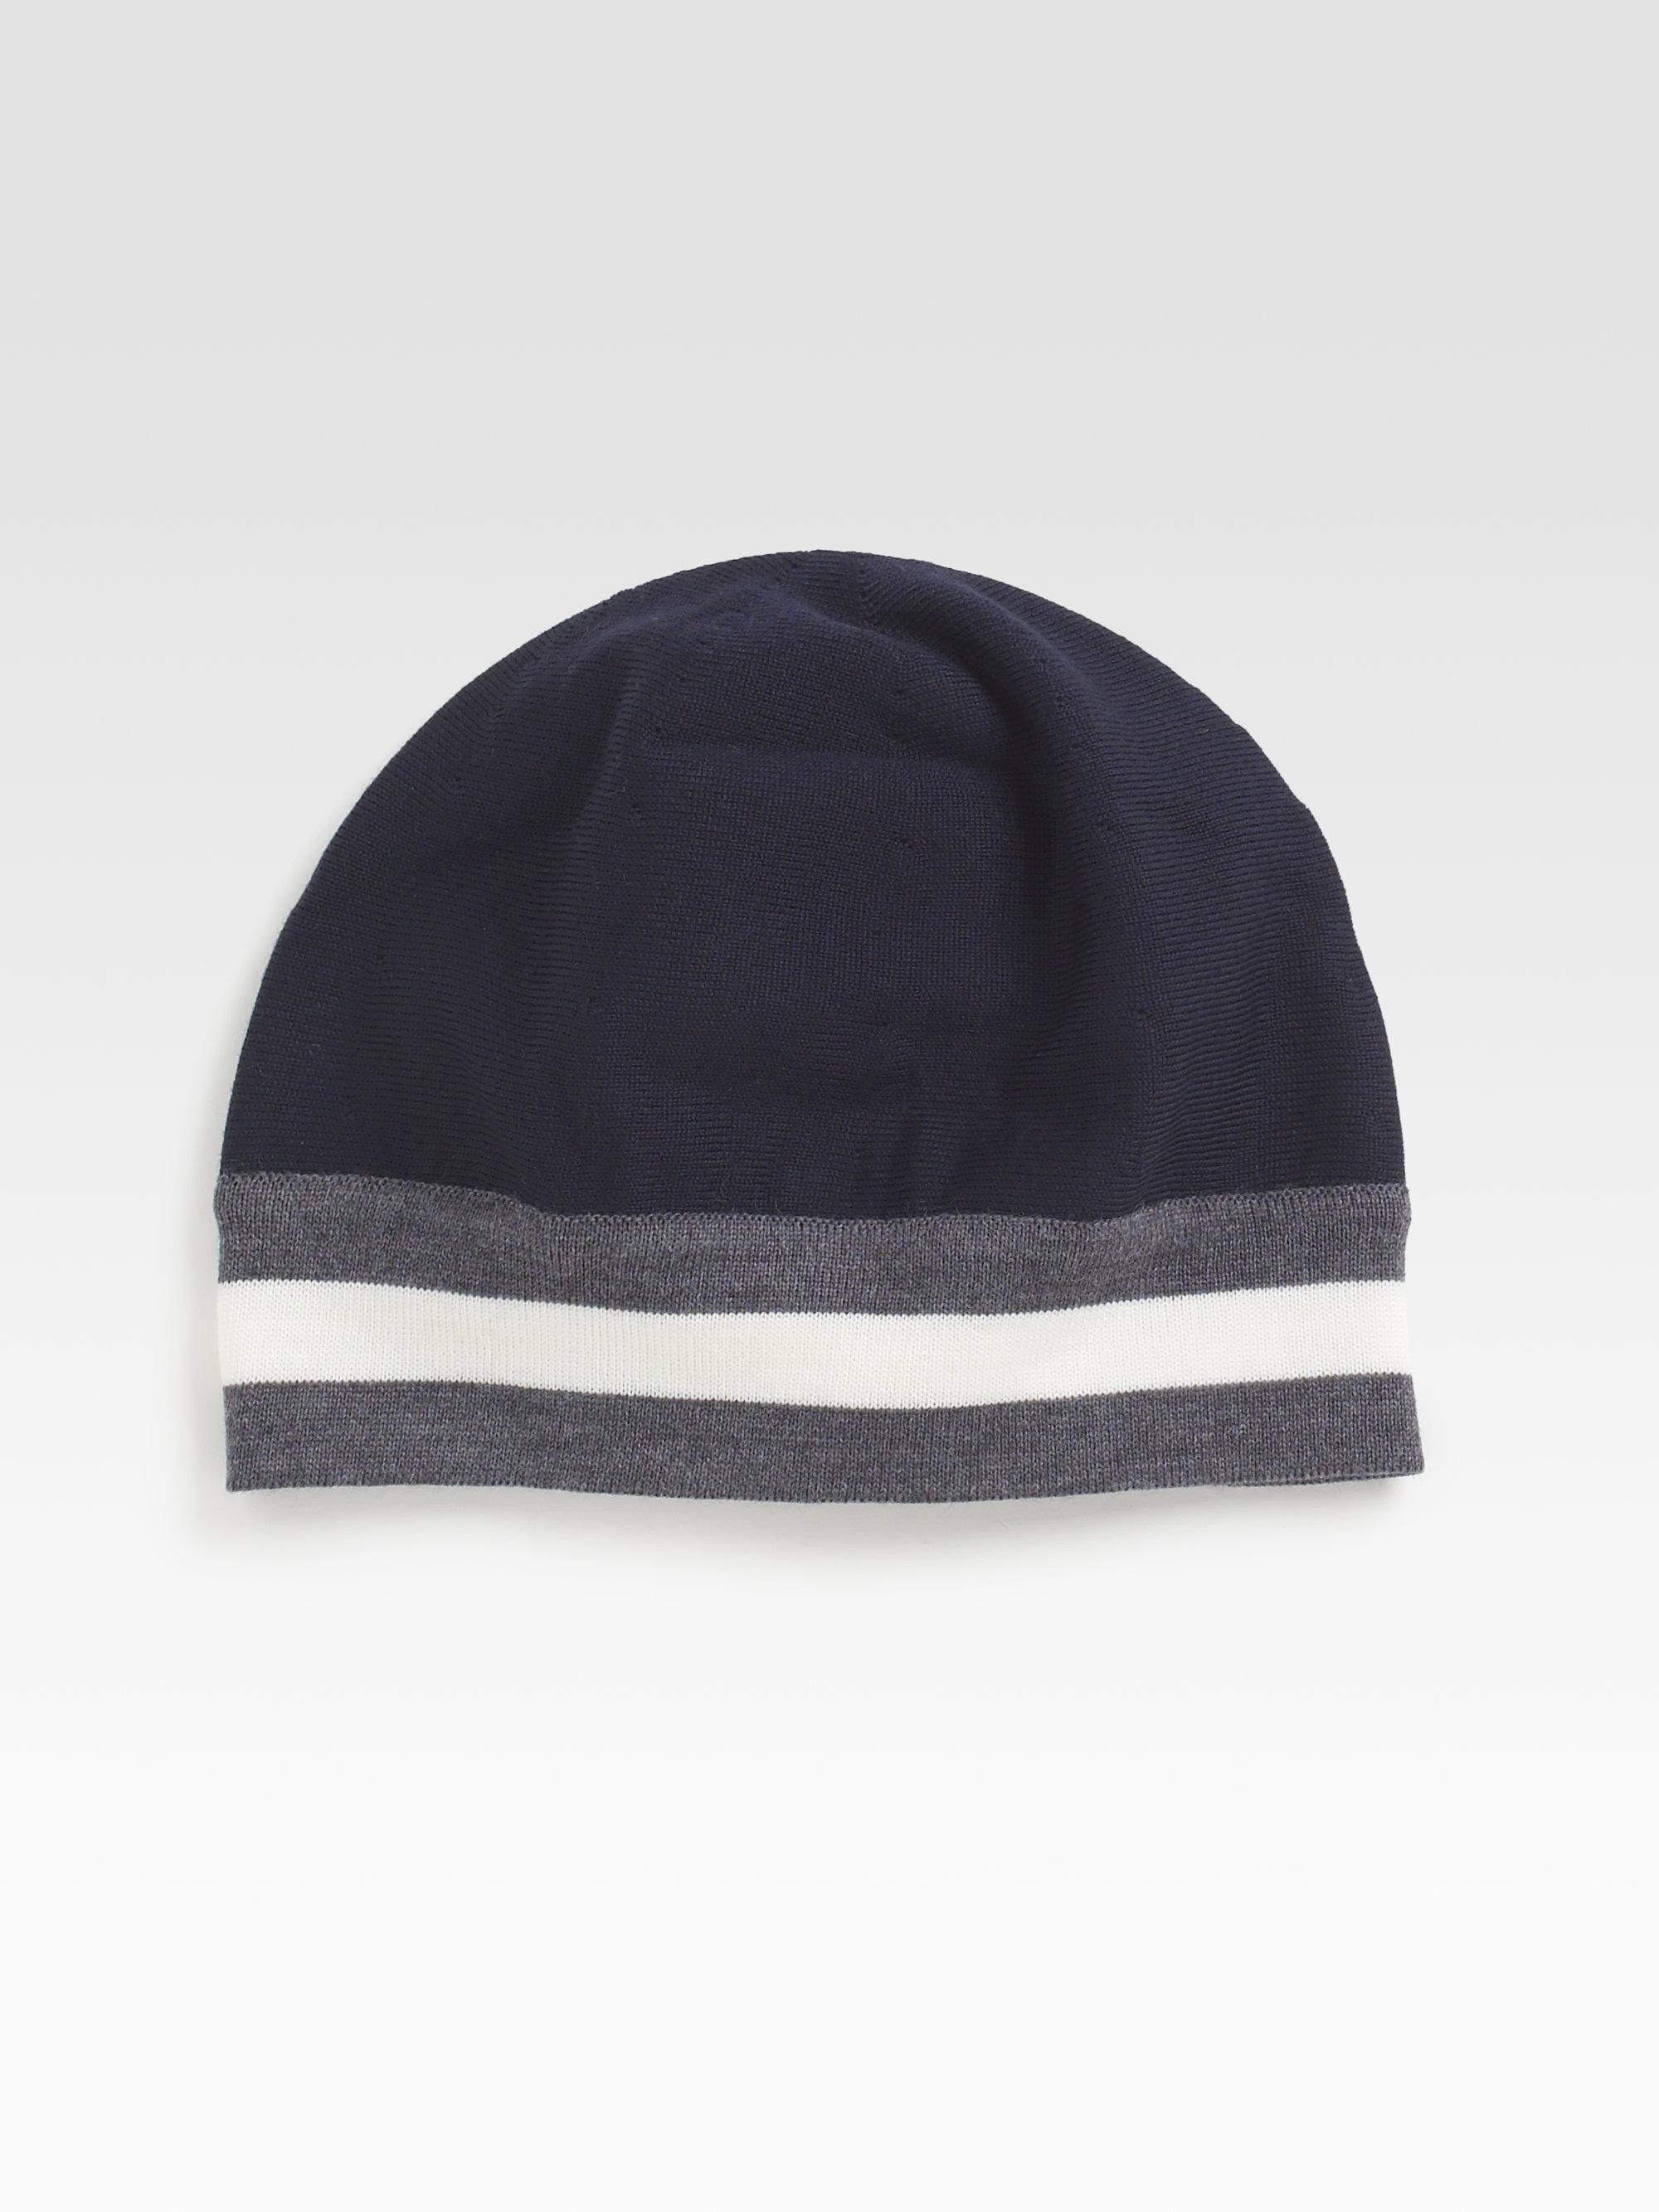 Bally Stripe Beanie Hat Blue, Mens wool beanie hat in blue navy Bally